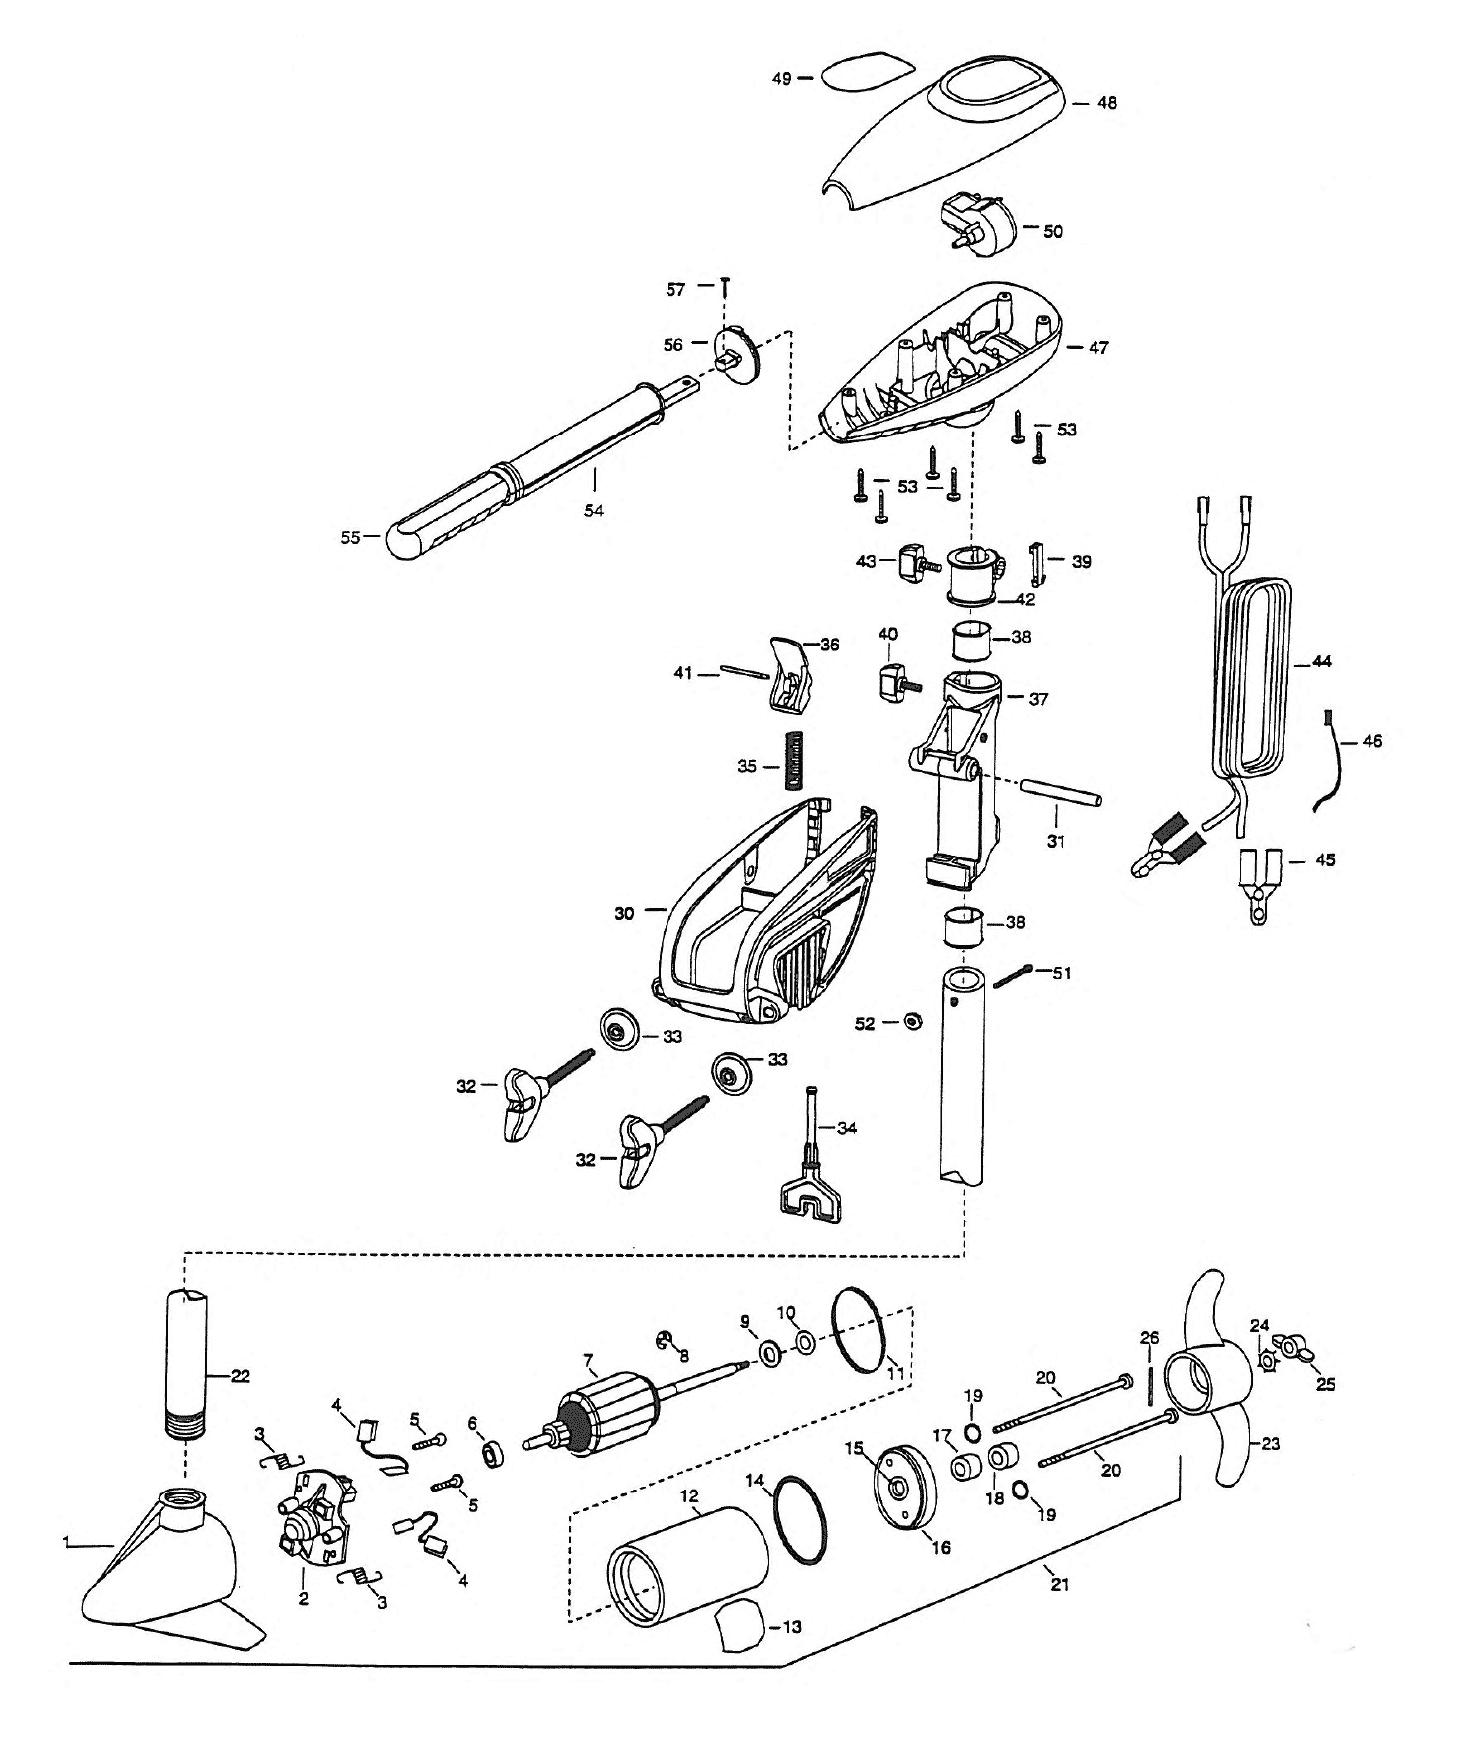 minn kota trolling motor diagram minn kota endura 46 parts - 1999 from fish307.com